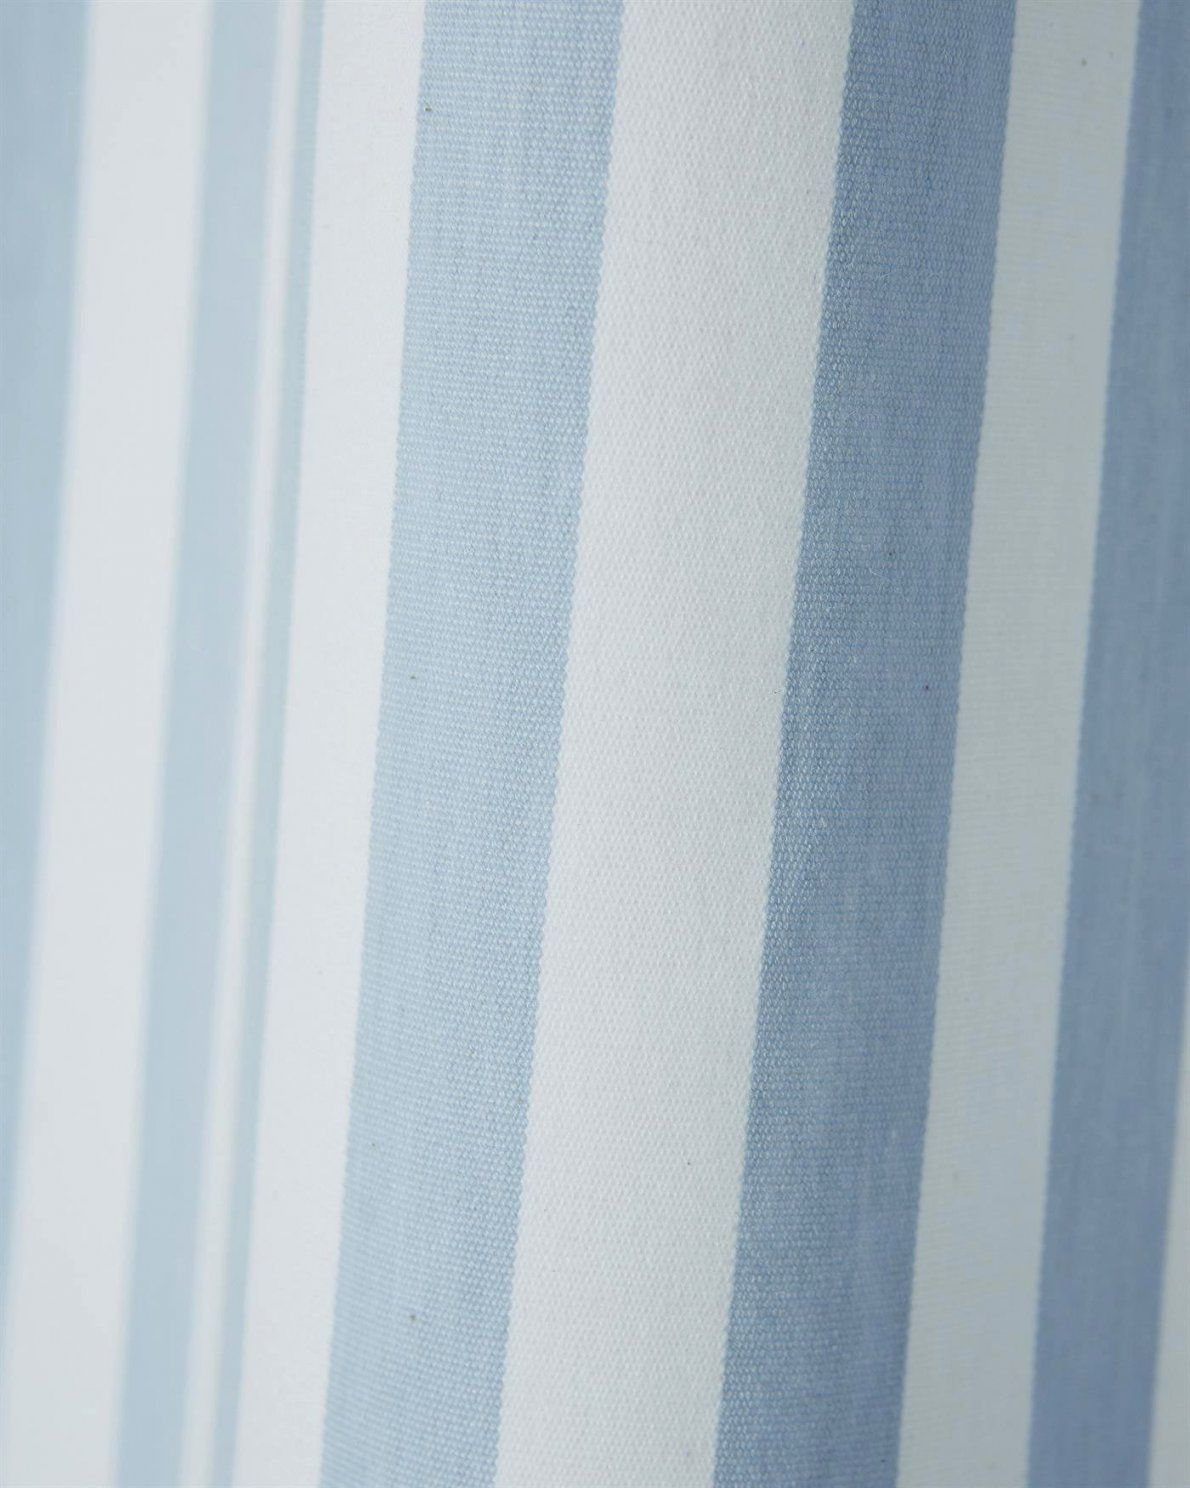 Gardinen Blau Wei Gestreift Cool Gerumiges Tapete Blau Wei von Gardinen Blau Weiß Gestreift Bild